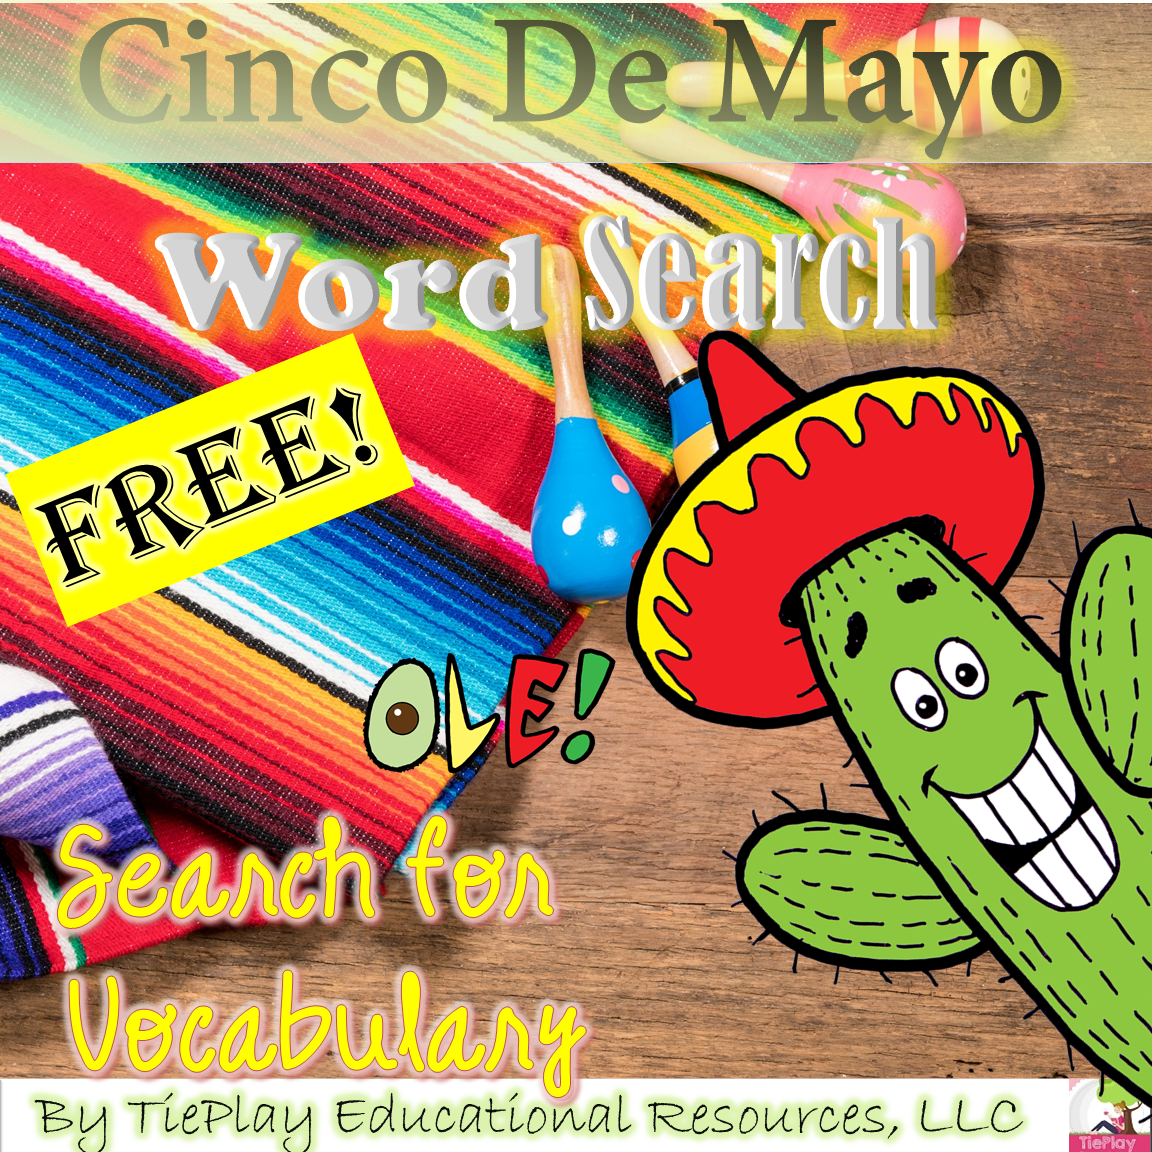 Tieplay Educational Resources Llc Free Cinco De Mayo